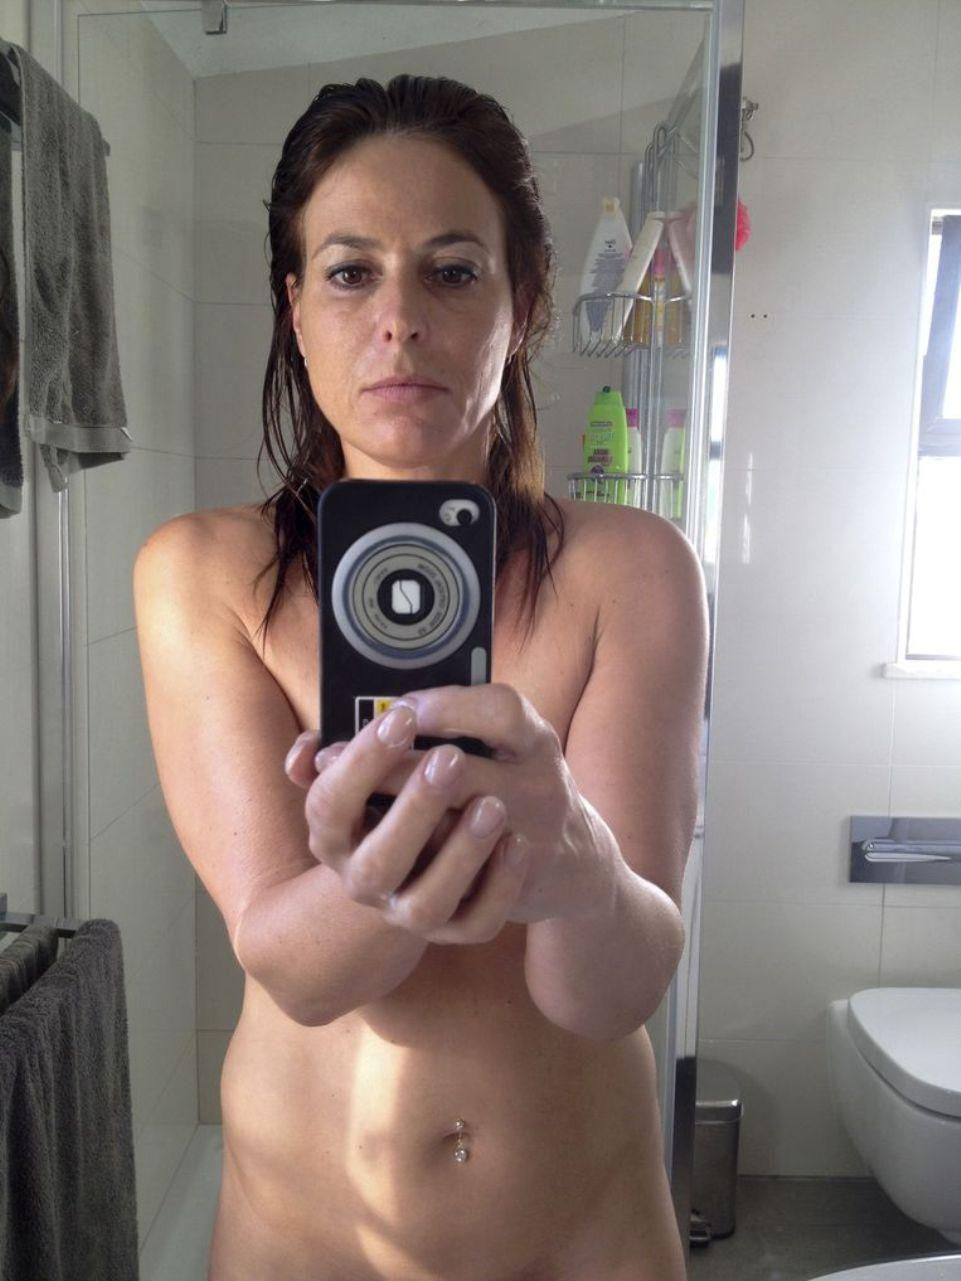 Naked wife make selfie of her natural body in bathroom mirror